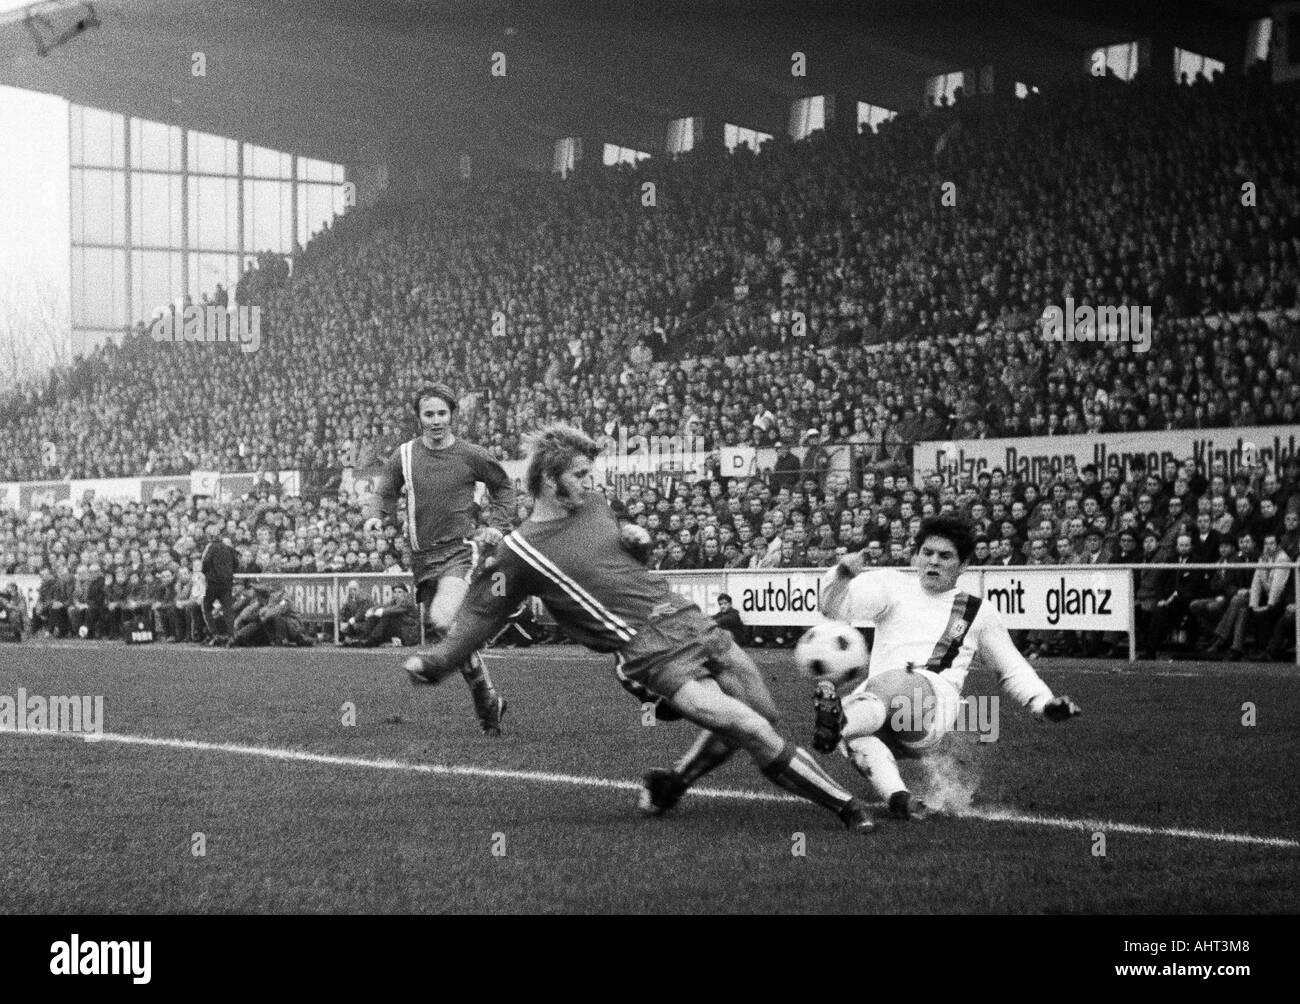 football, Bundesliga, 1970/1971, Stadium at the Hafenstrasse in Essen, Rot-Weiss Essen versus Borussia Moenchengladbach 1:2, scene of the match, f.l.t.r. Wolfgang Rausch, Peter Czernotzky (both RWE), Heinz Wittmann (MG) - Stock Image